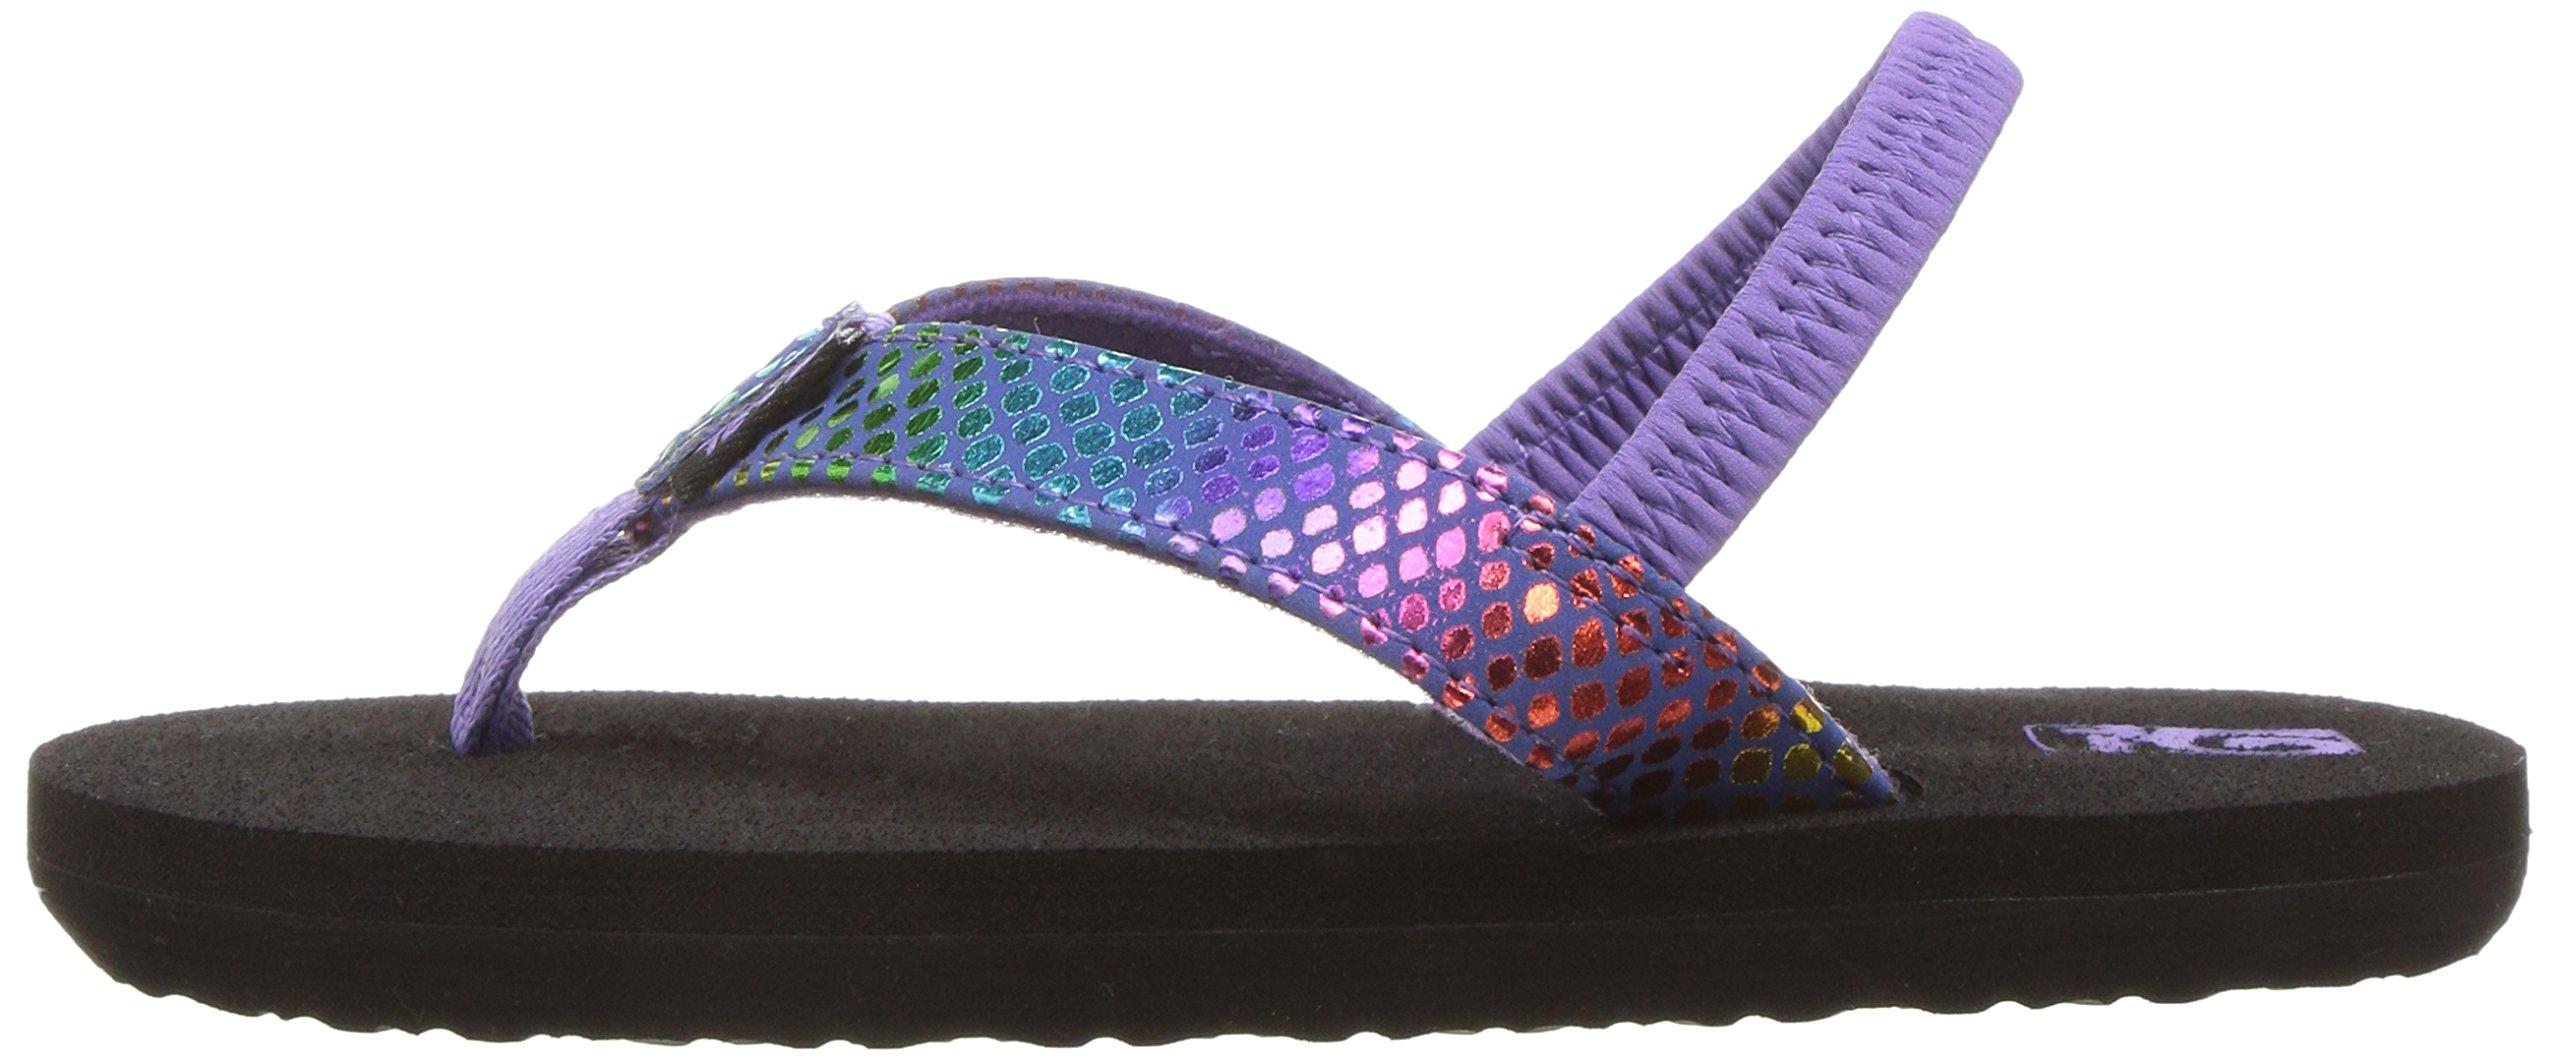 331893259d78a Teva Mush II Girls Sandals Purple Multi Snake 0 US   M 889642515437 ...